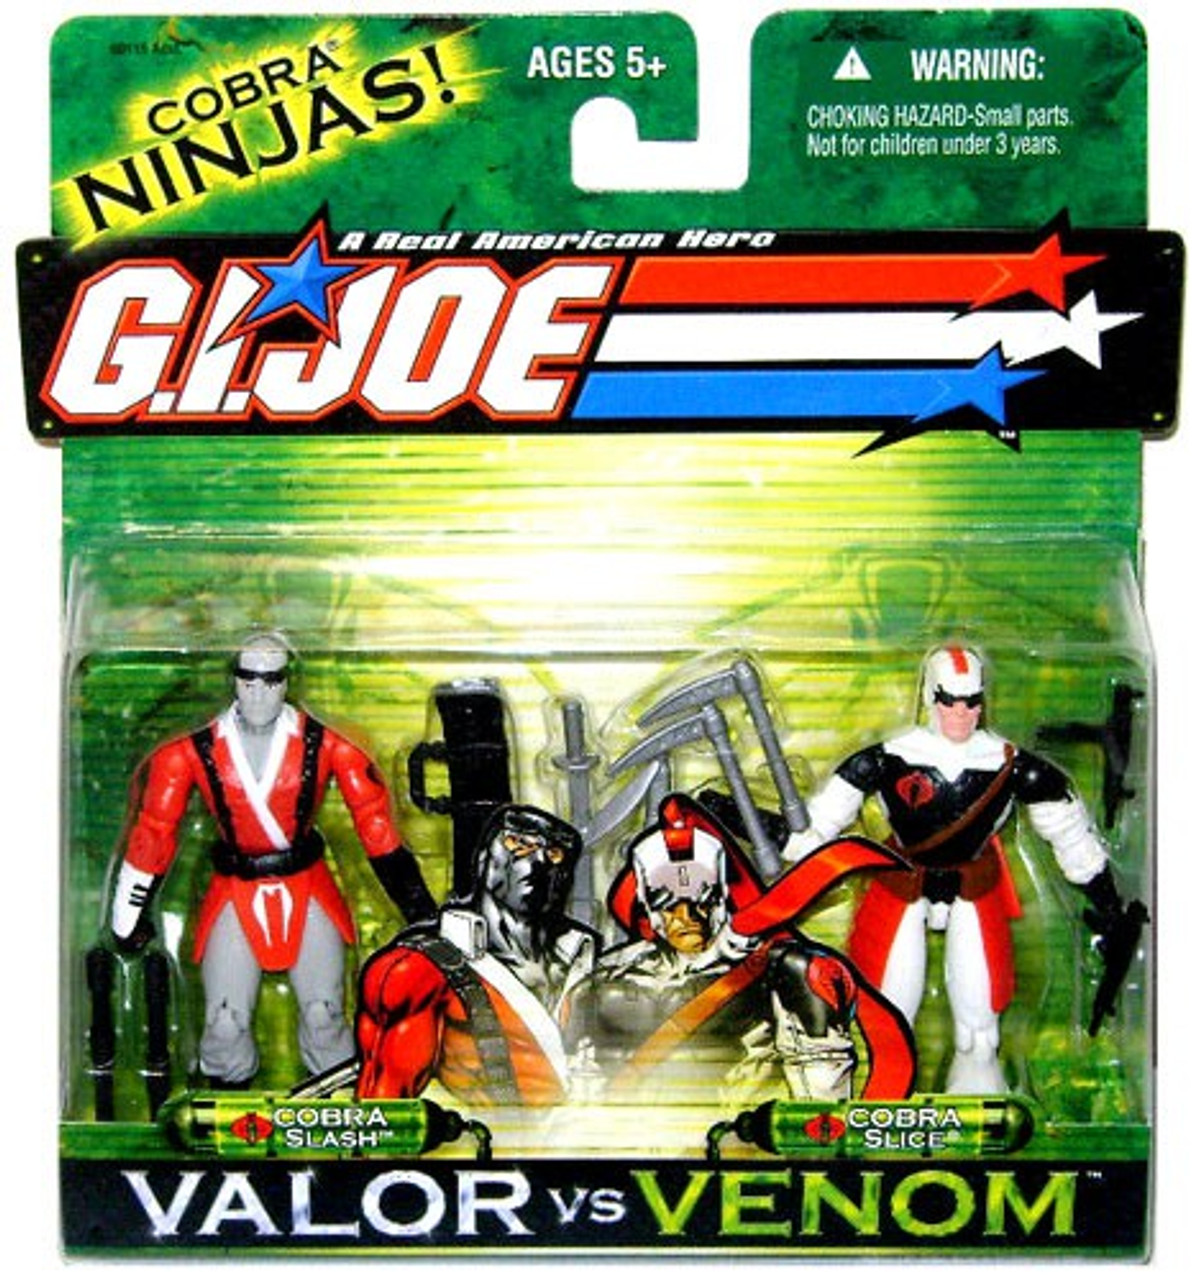 GI Joe Valor vs. Venom Cobra Slash & Cobra Slice Action Figure 2-Pack